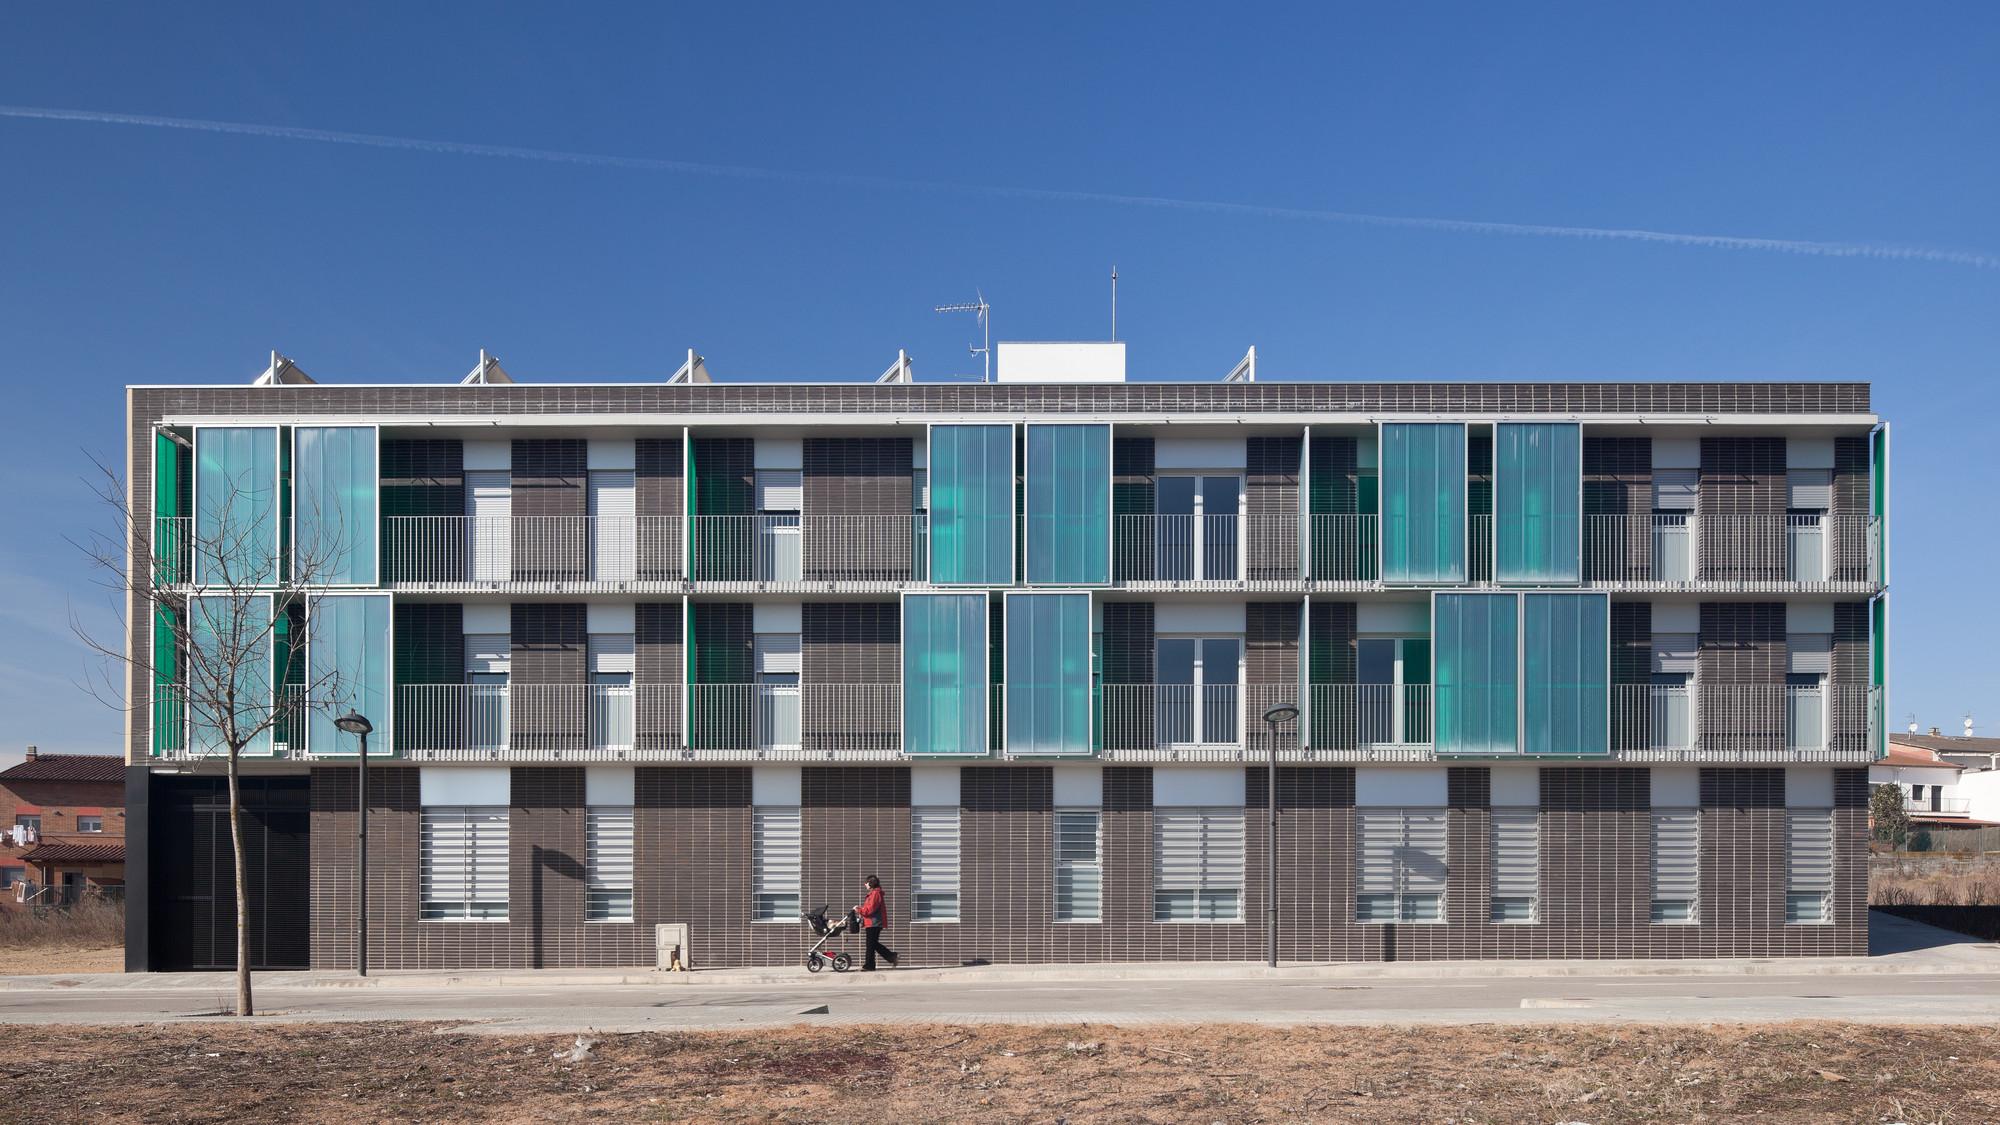 17 VPO Dwellings / Màrius Quintana Creus, © Marc Torra